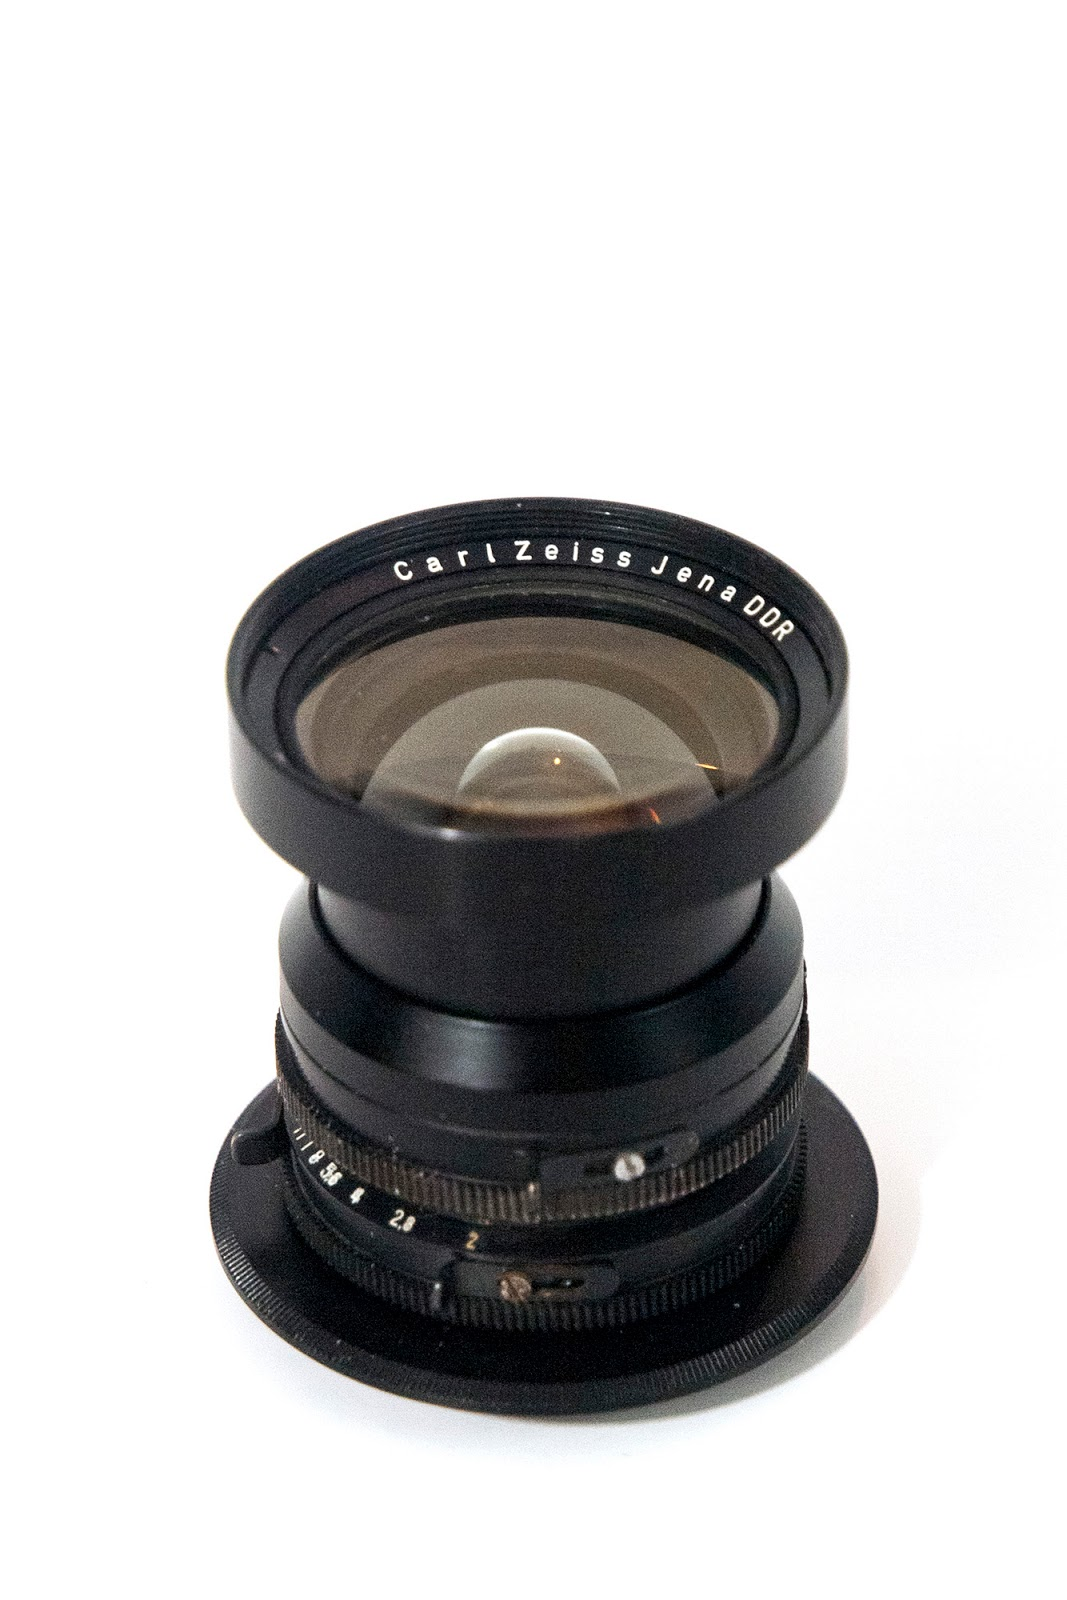 Tevidon 10/2 (10mm f2.0 C-mount)